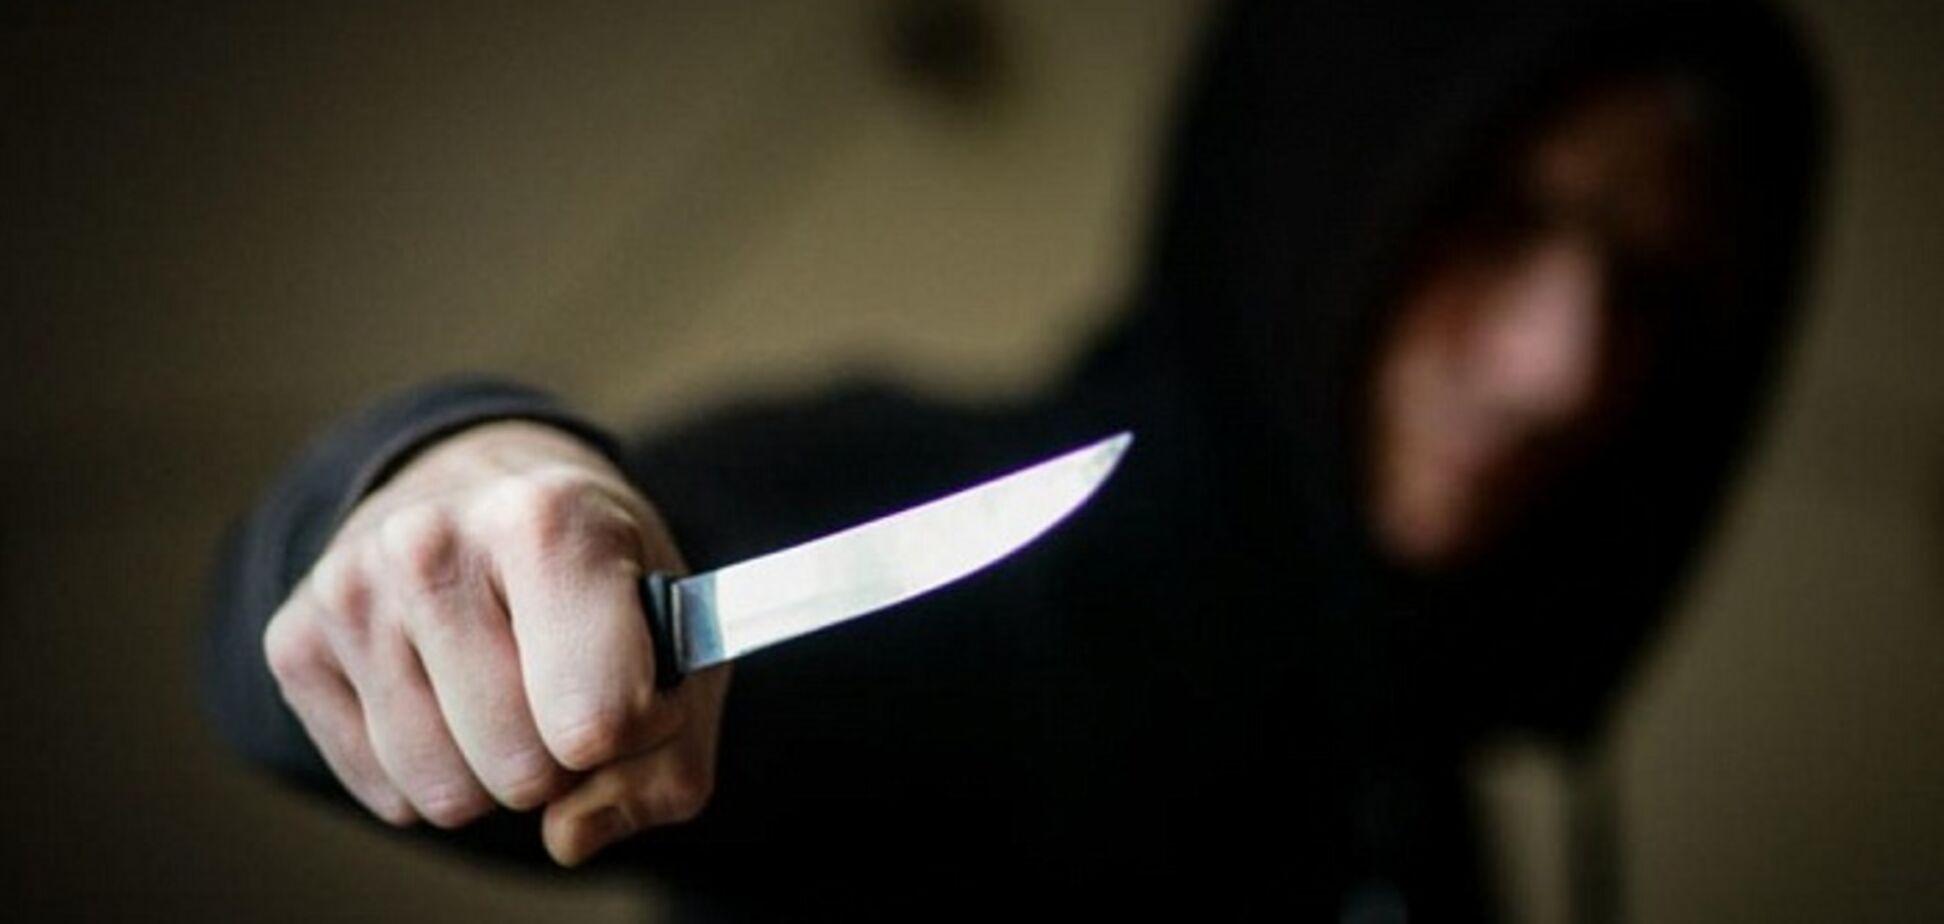 Ножом по шее и телу: на Днепропетровщине рецидивист спьяну чуть не убил друга